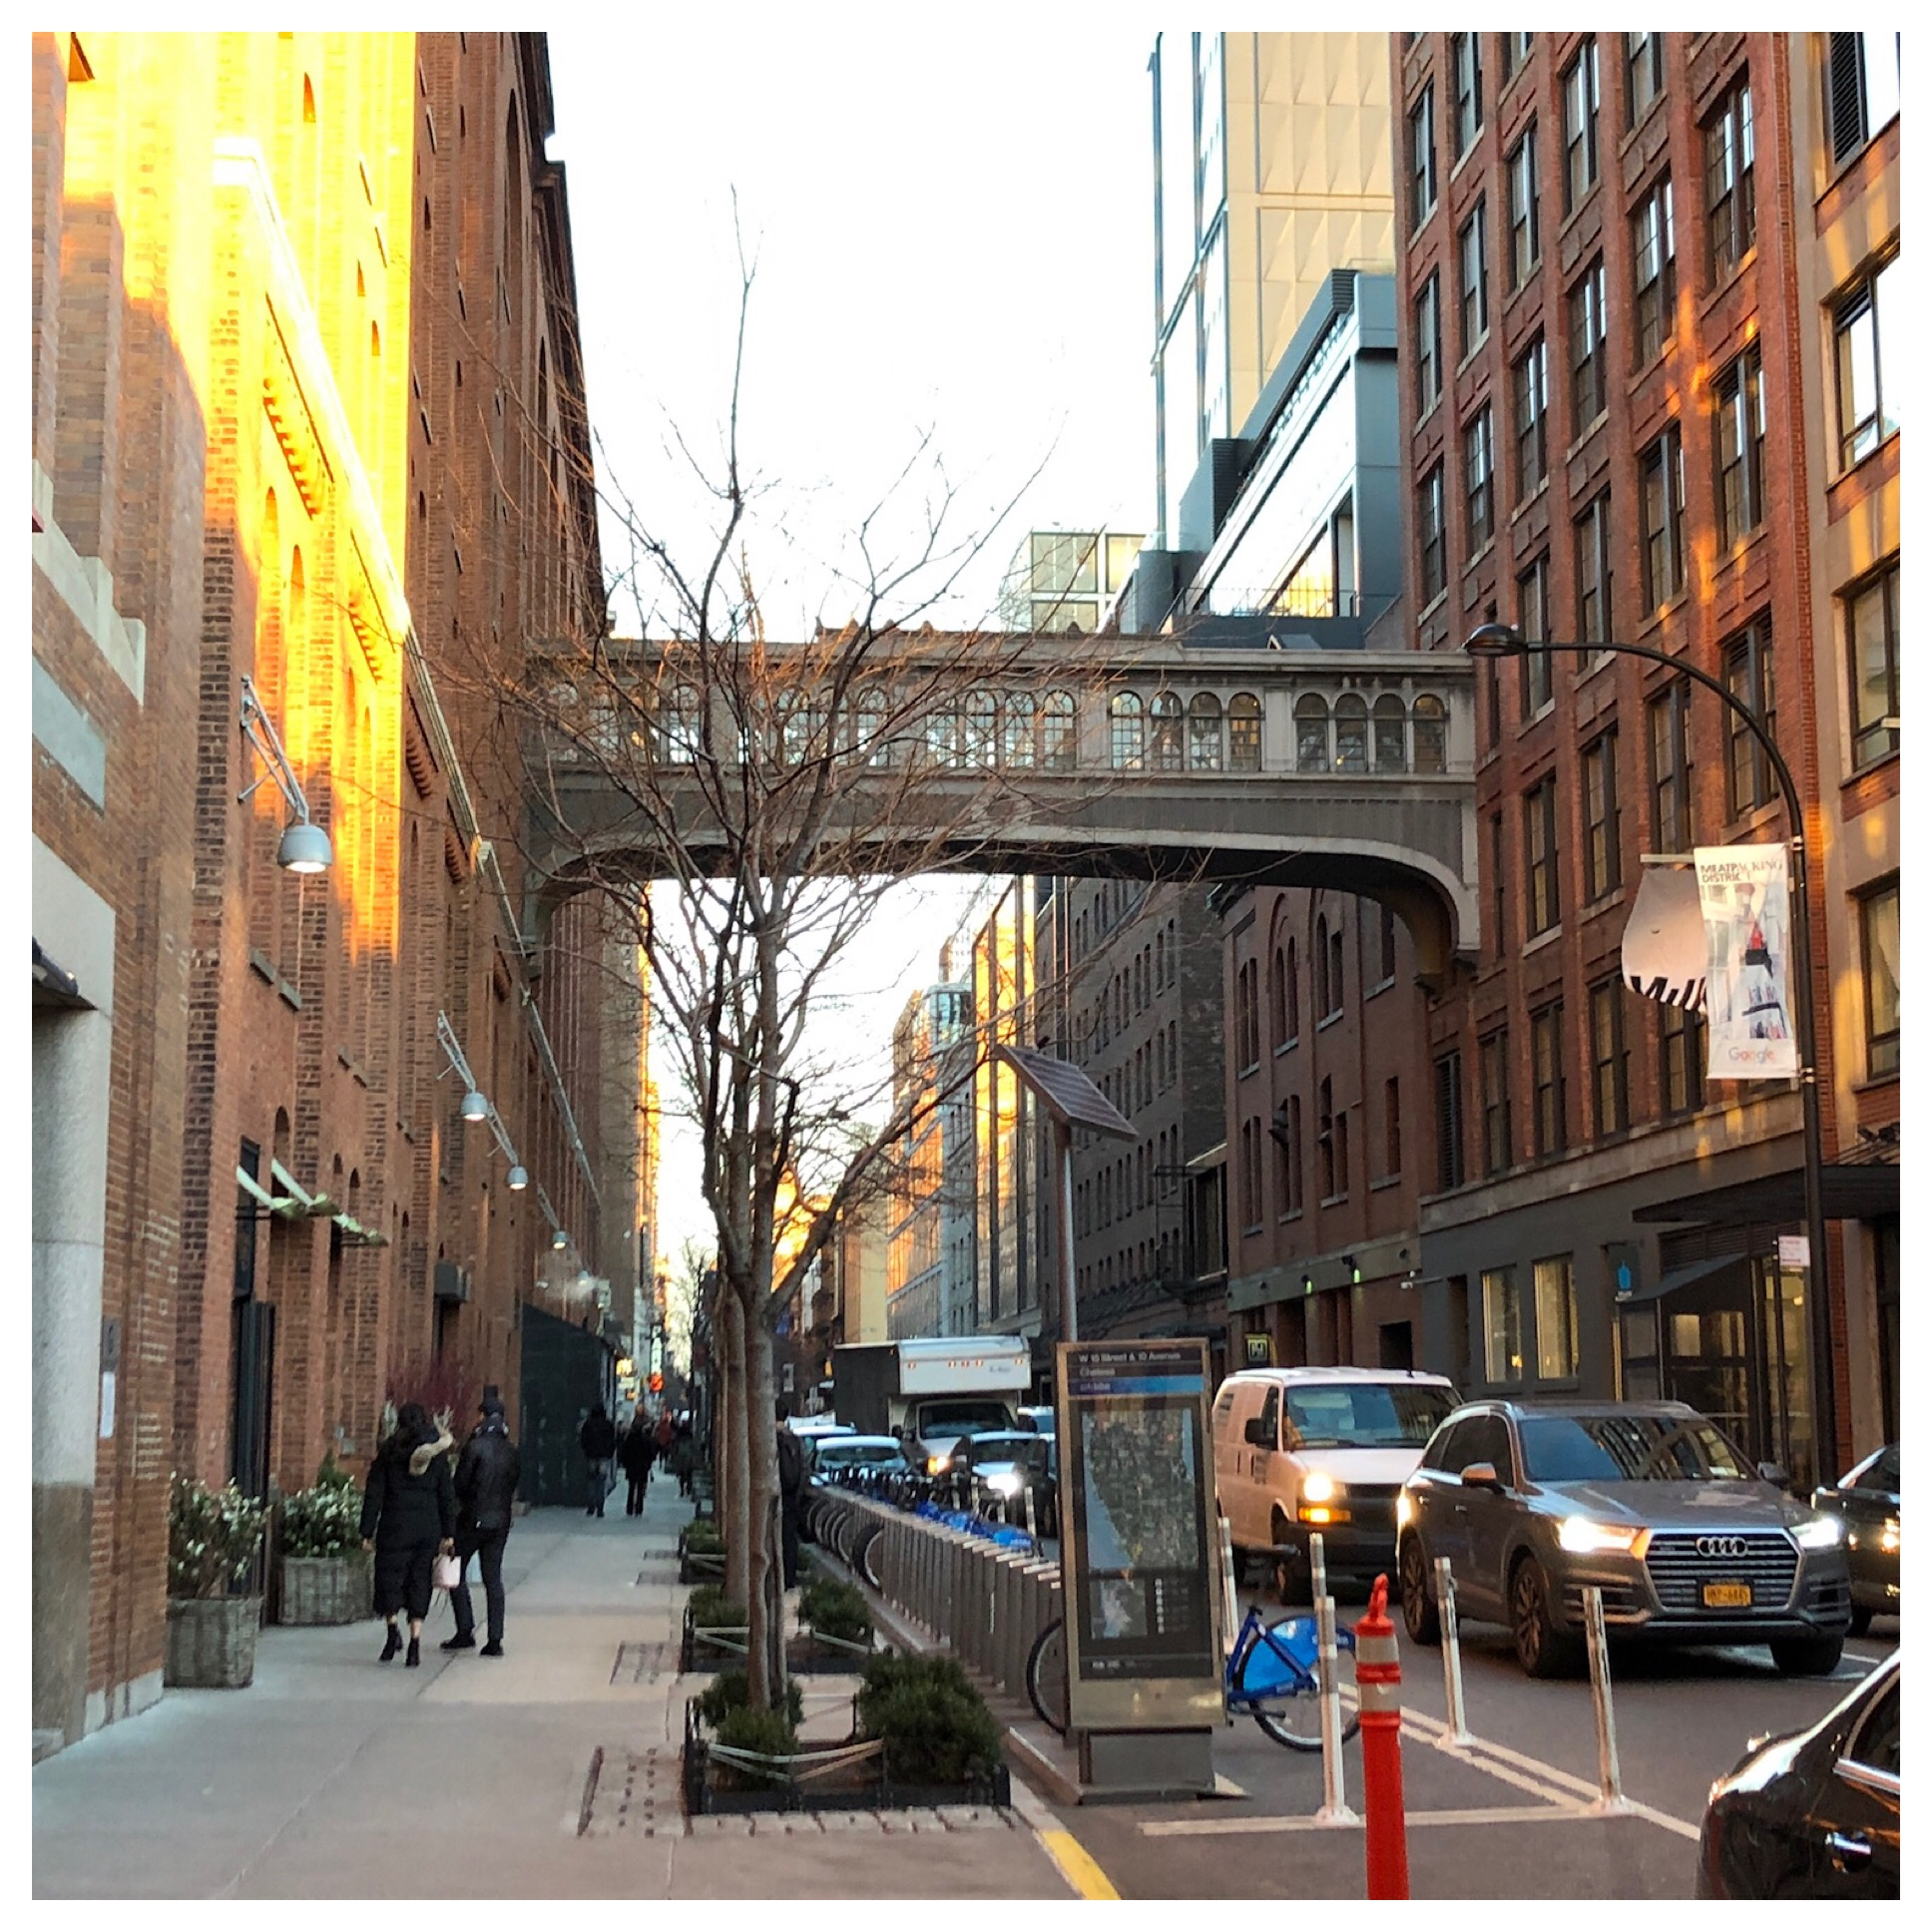 New York's version of the Bridge of Sighs?